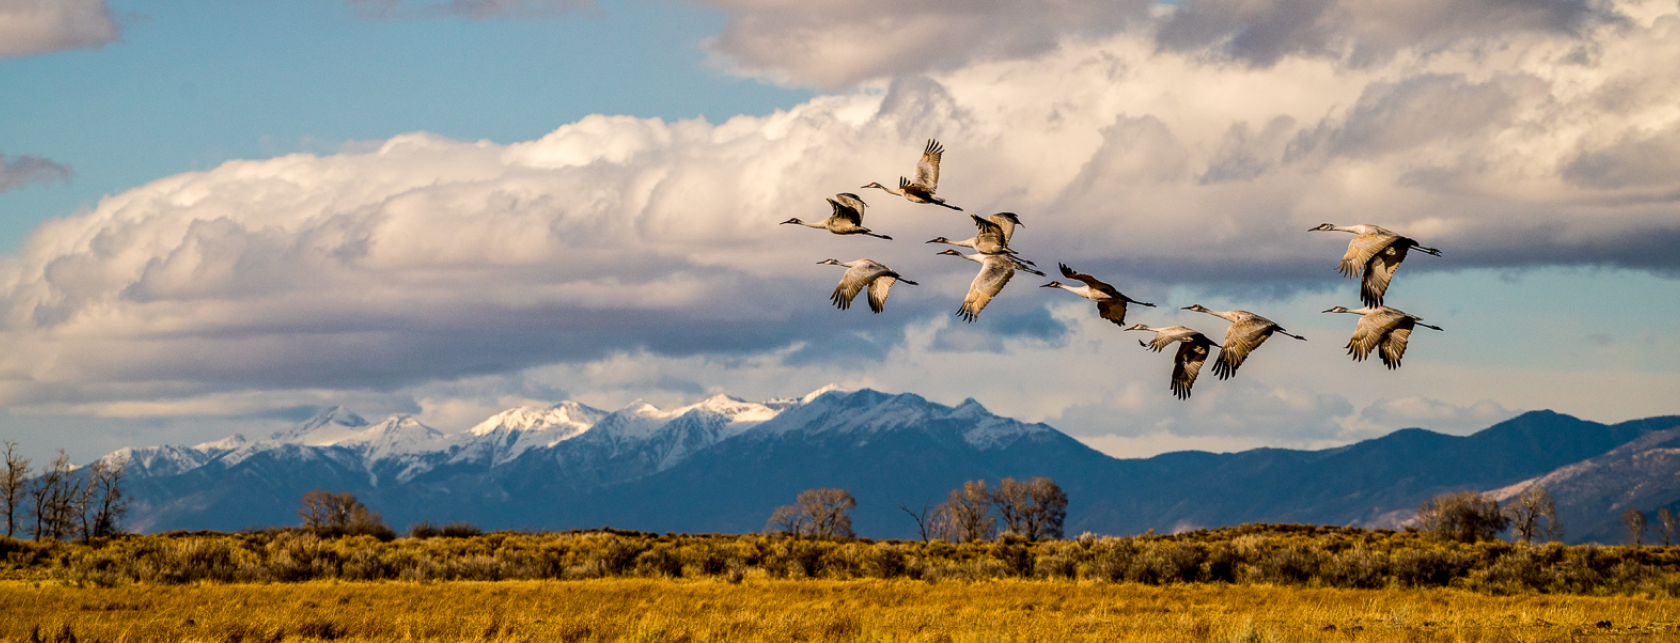 Bird Watching and Wildlife Viewing